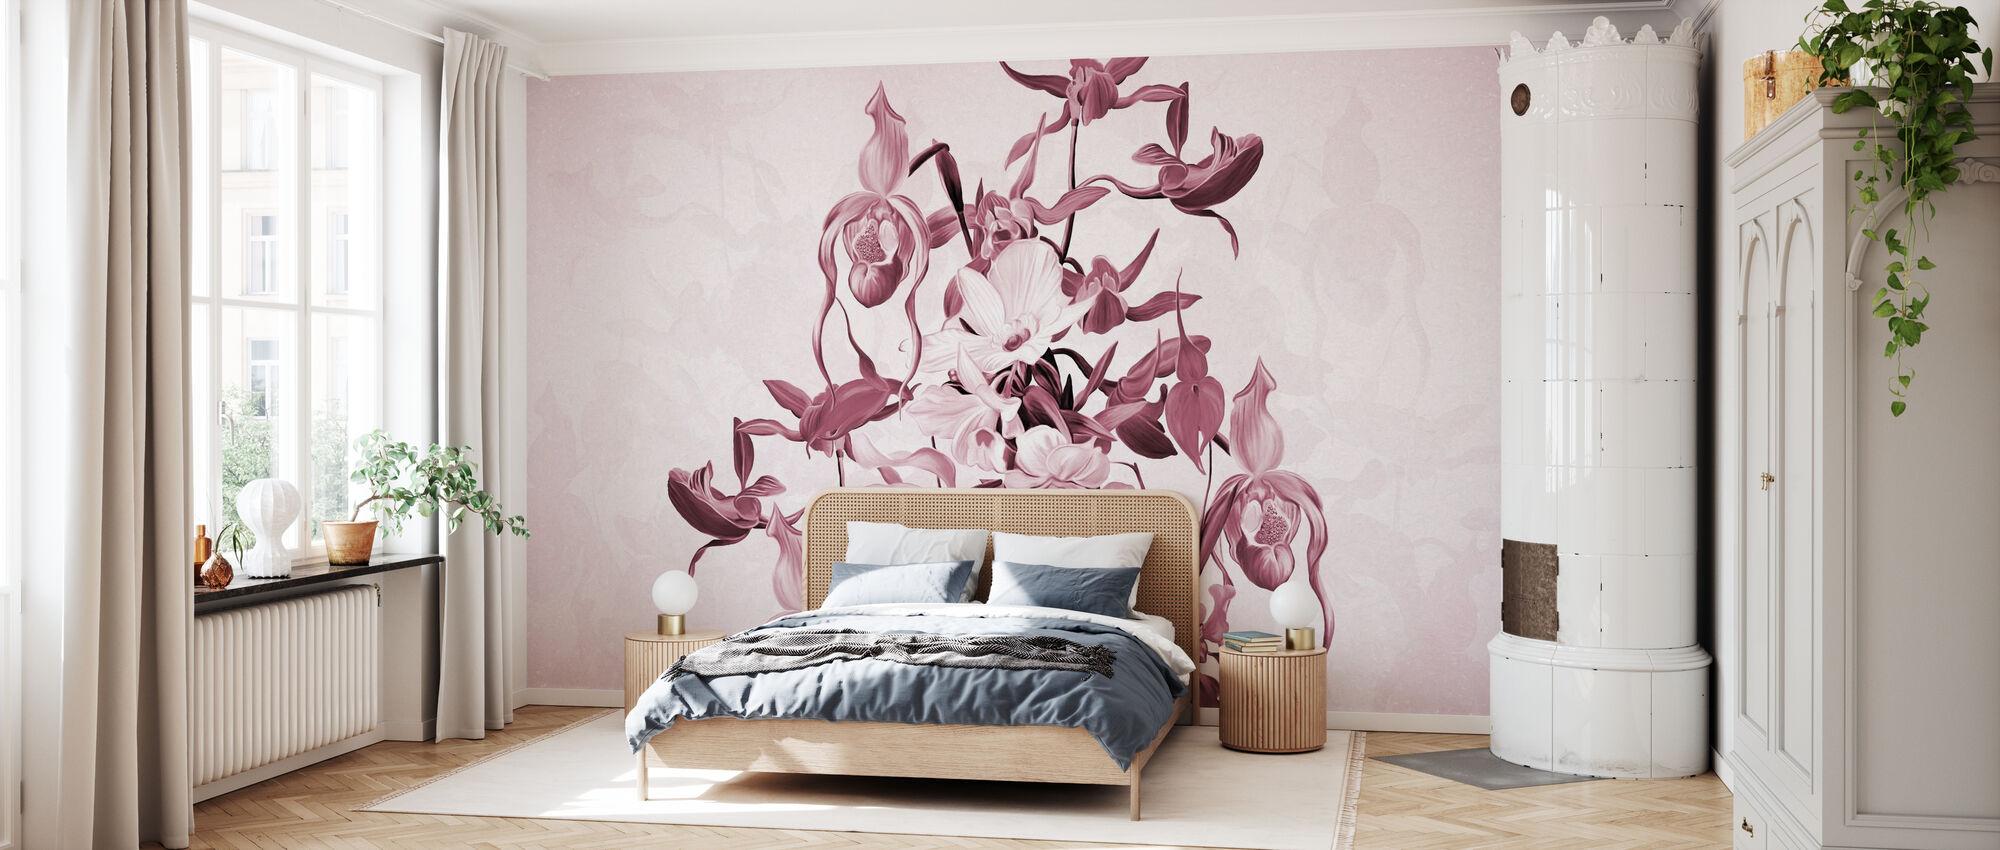 Blooming Orchids - Violet - Wallpaper - Bedroom